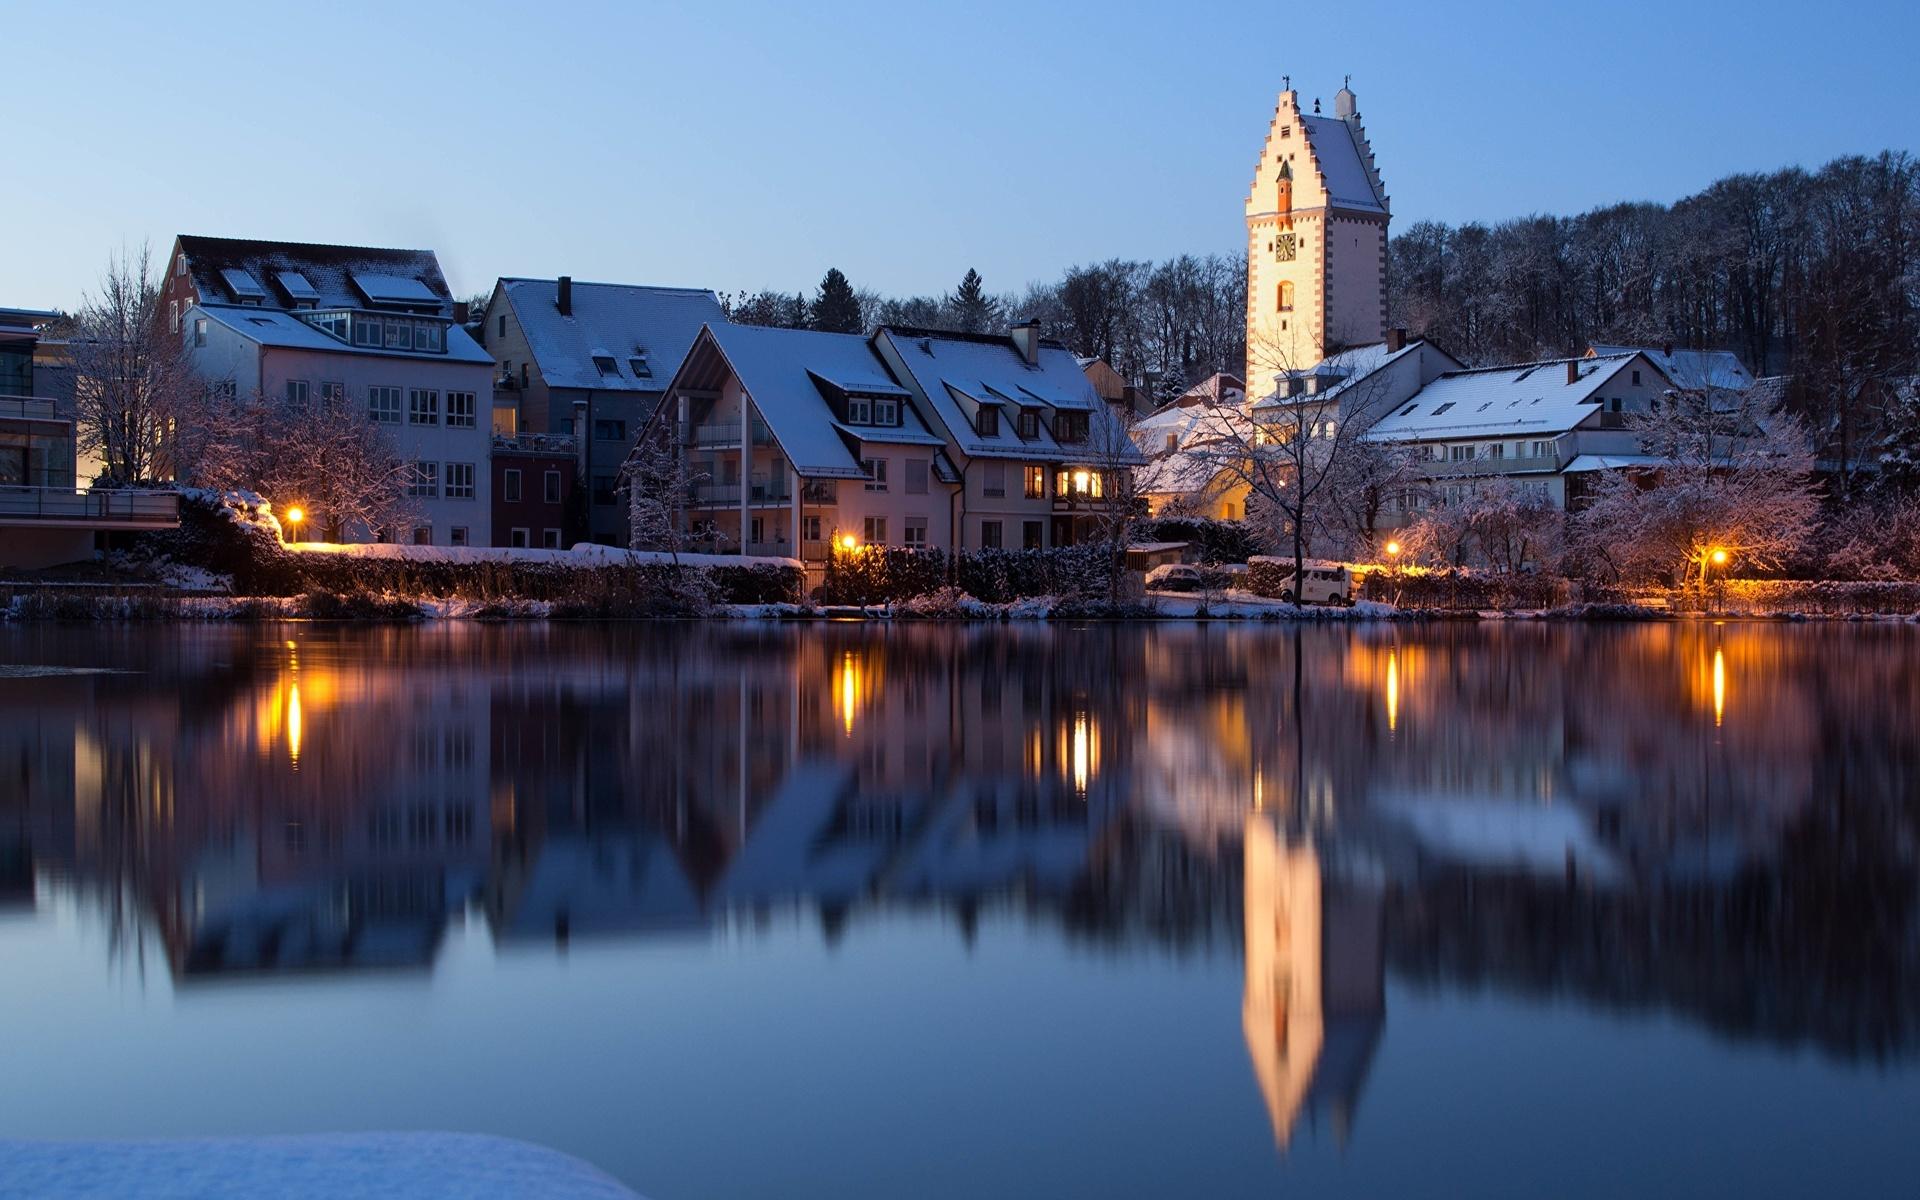 германия, дома, озеро, вечер, bad waldsee, отражение, башня, город